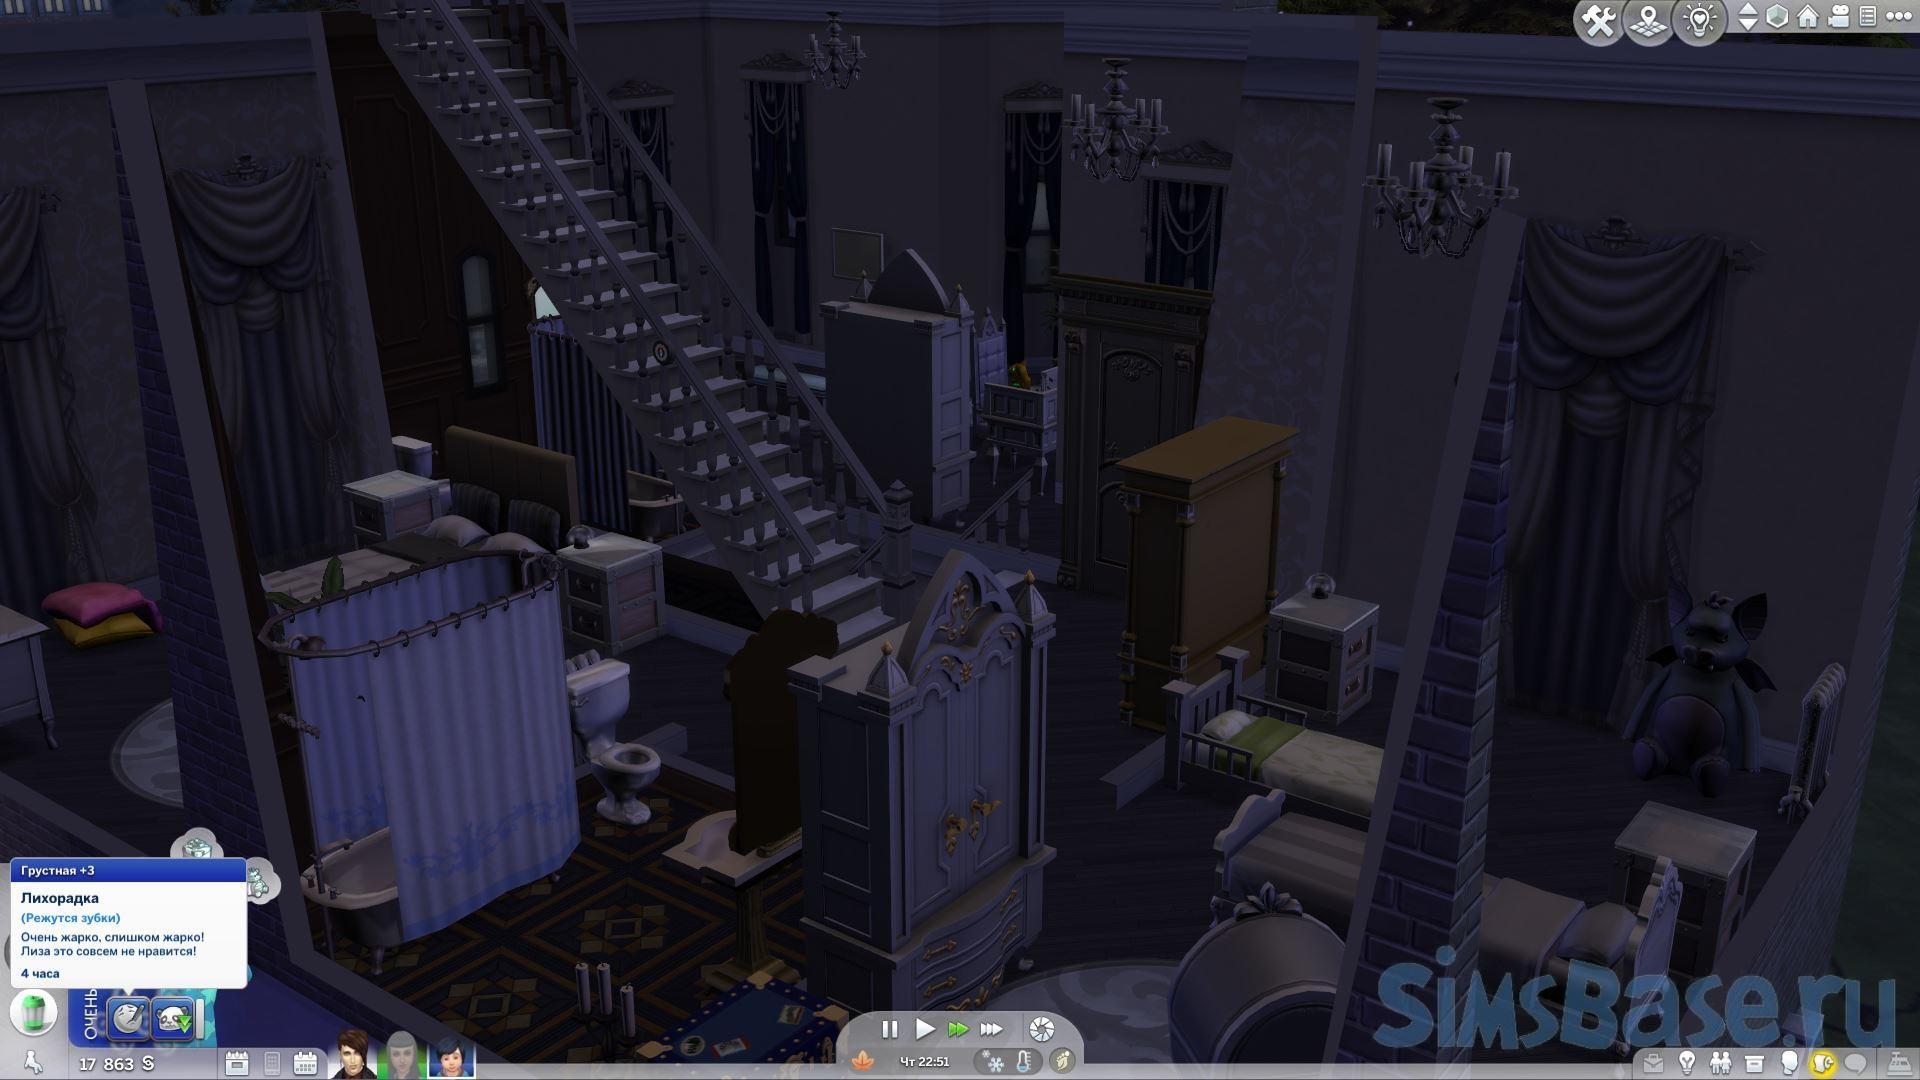 Мод «Уход за зубами или Dental Care Mod» от adeepindigo для Sims 4